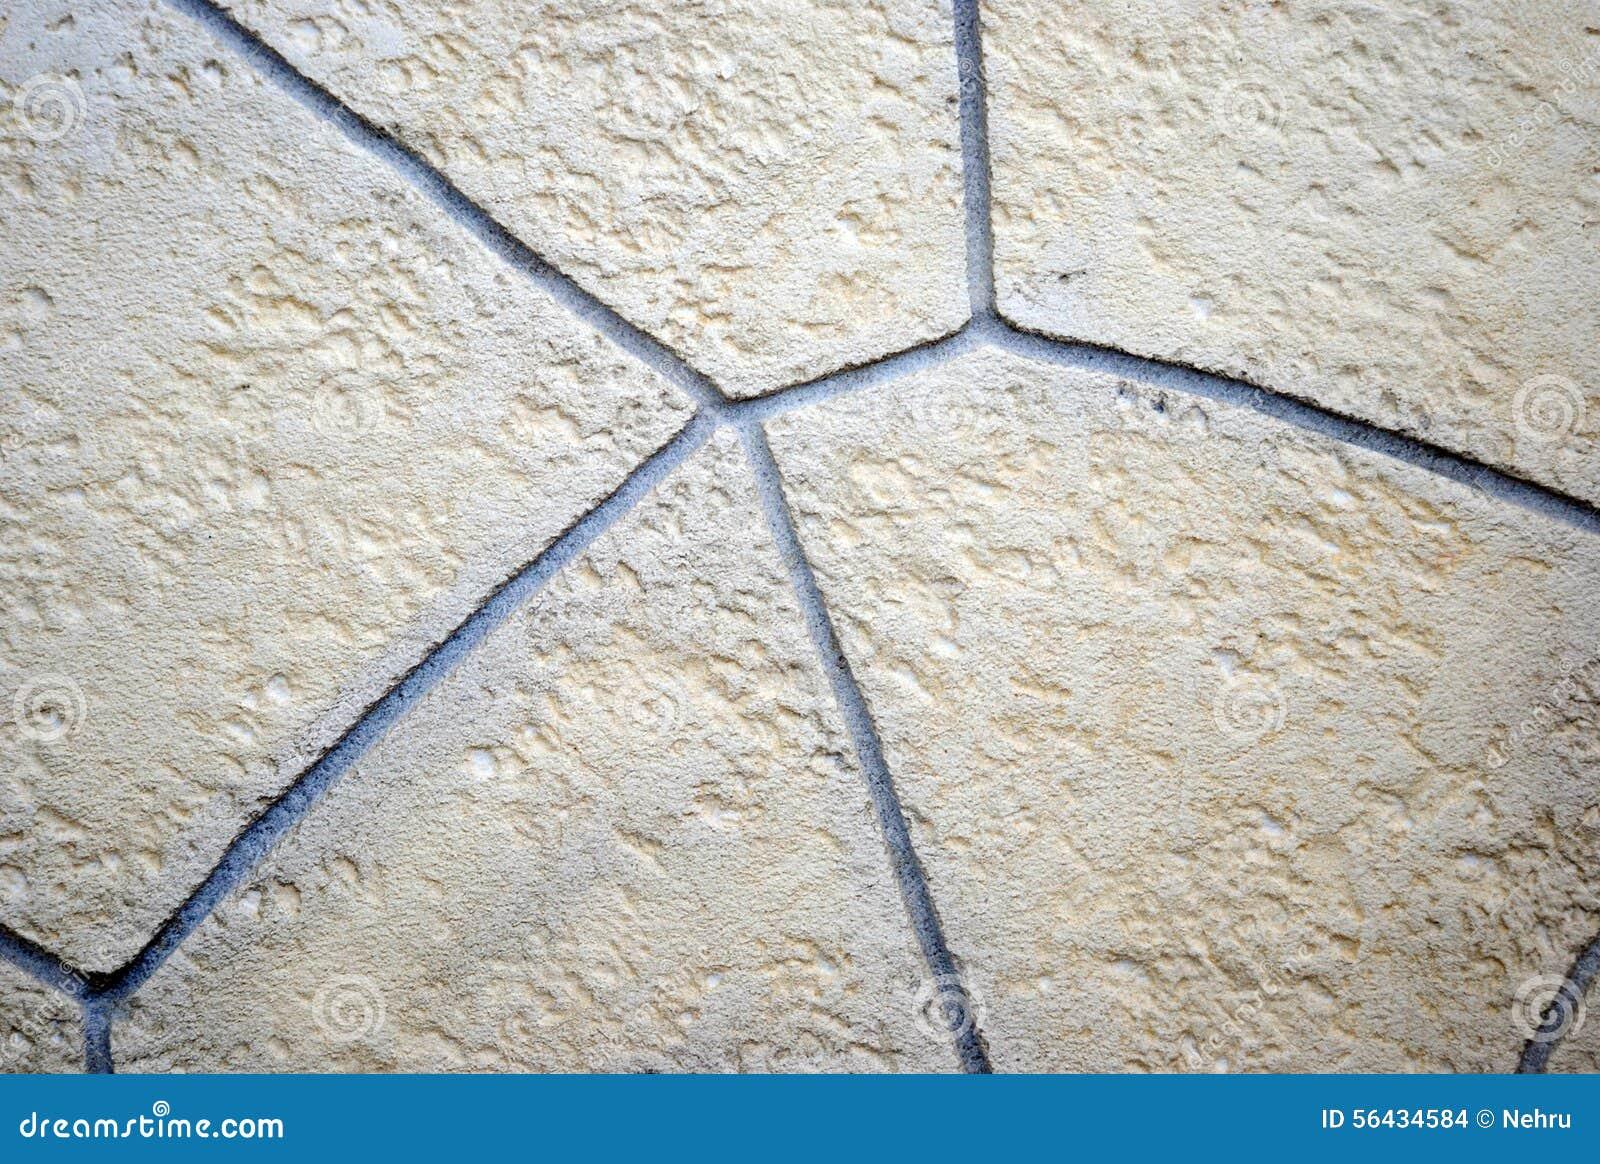 Decorative Tiles Stock Photo Image 56434584